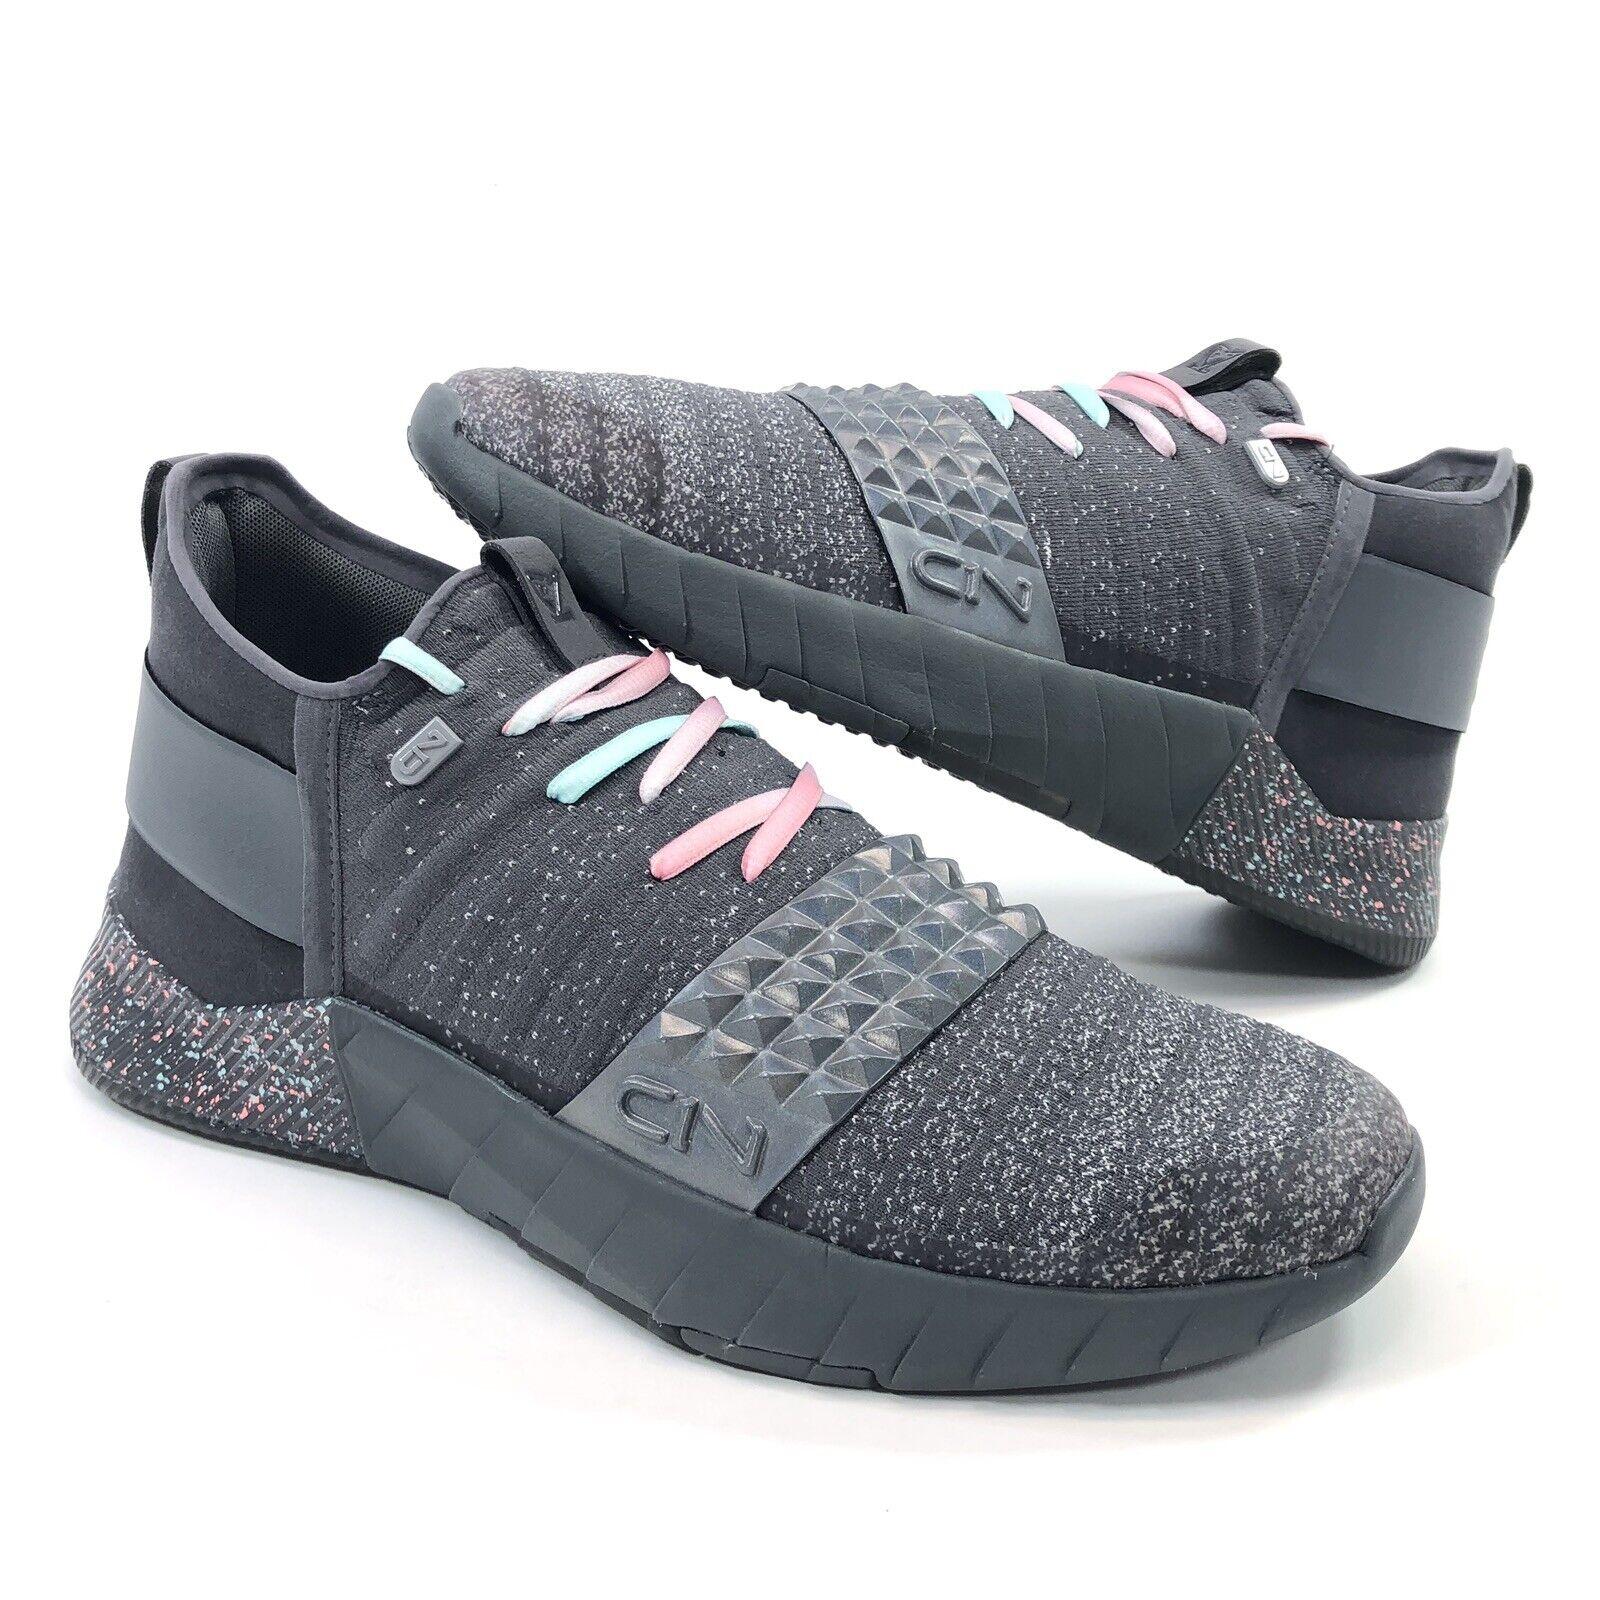 C1n Trainer Shoes Cam Newton